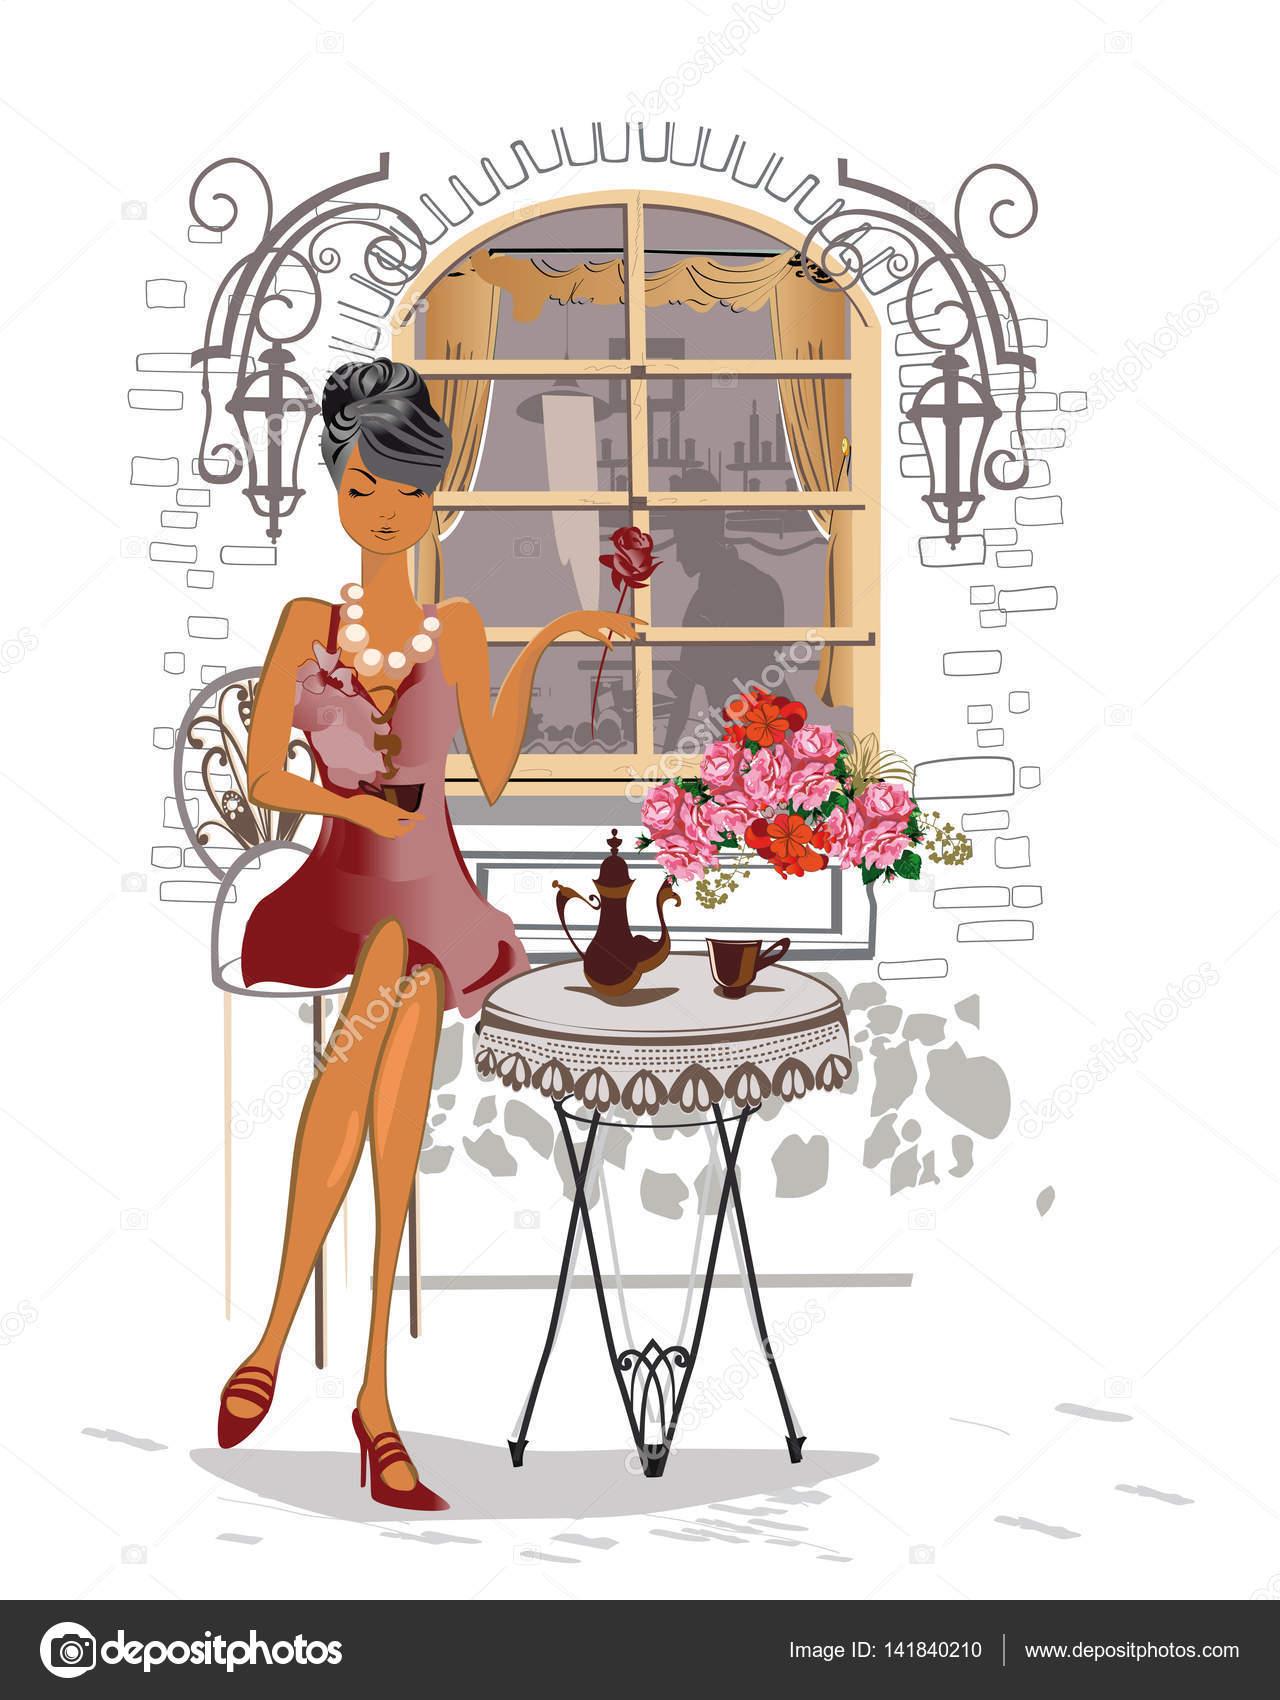 Fashion Cartoon Girl Wallpaper 系列的街头咖啡馆喝咖啡的人与城市。在马路对面的咖啡馆里的女孩 图库矢量图像 169 Laifalight 141840210